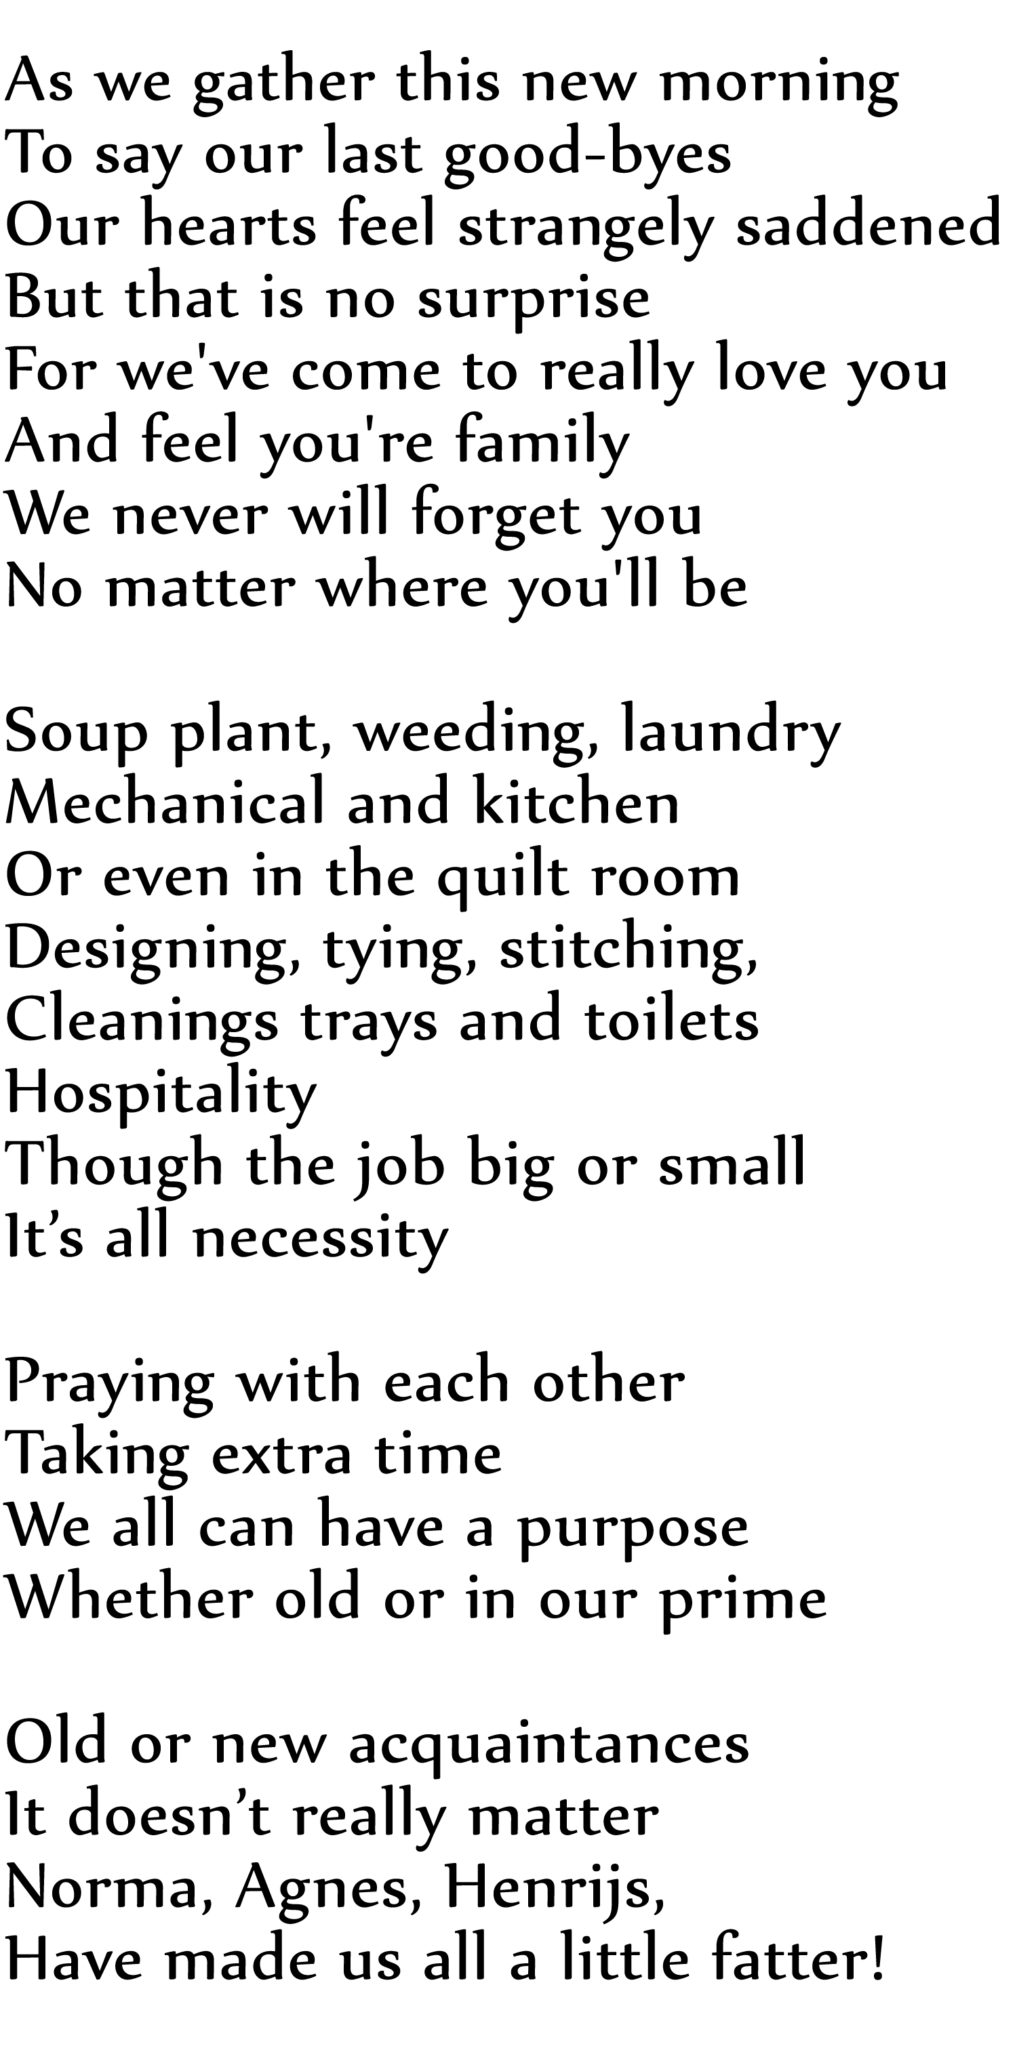 NormaJeanPoem